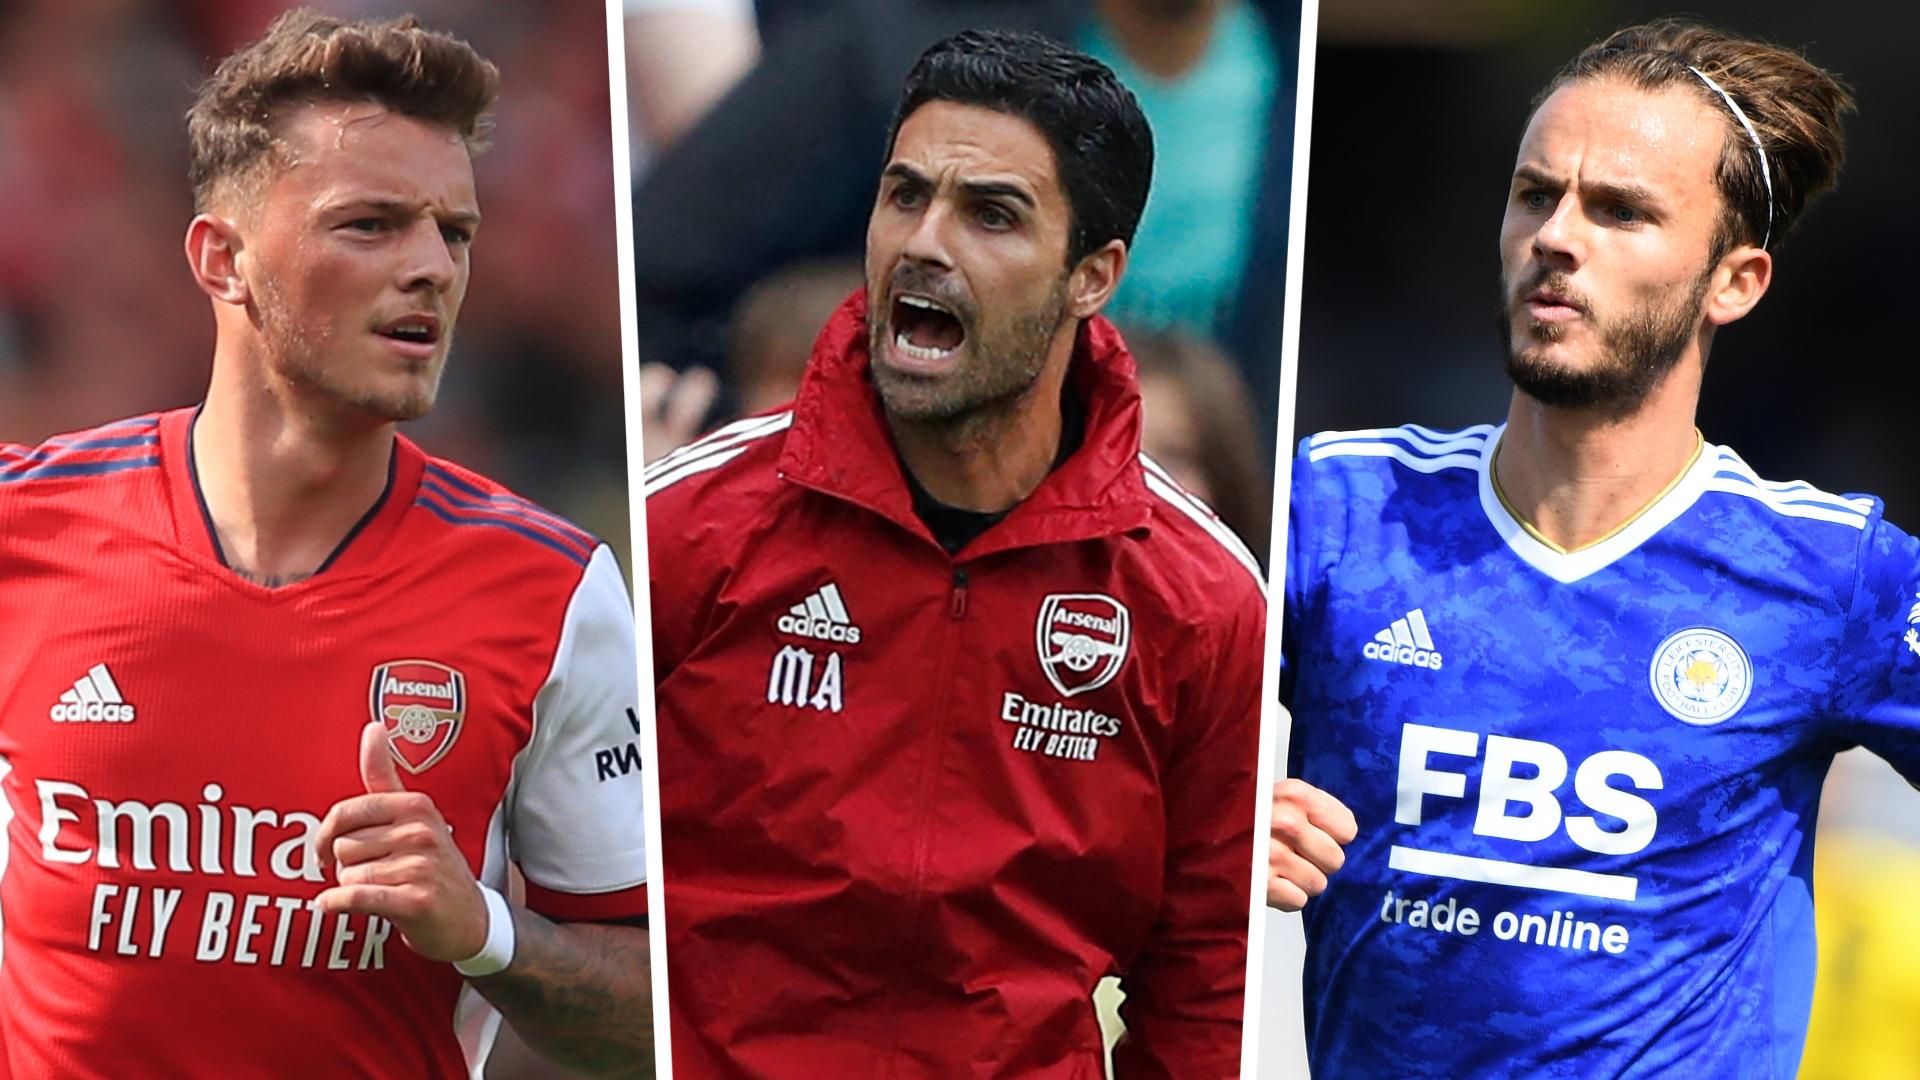 Arteta 'sure' Arsenal will do more business before summer transfer window closes